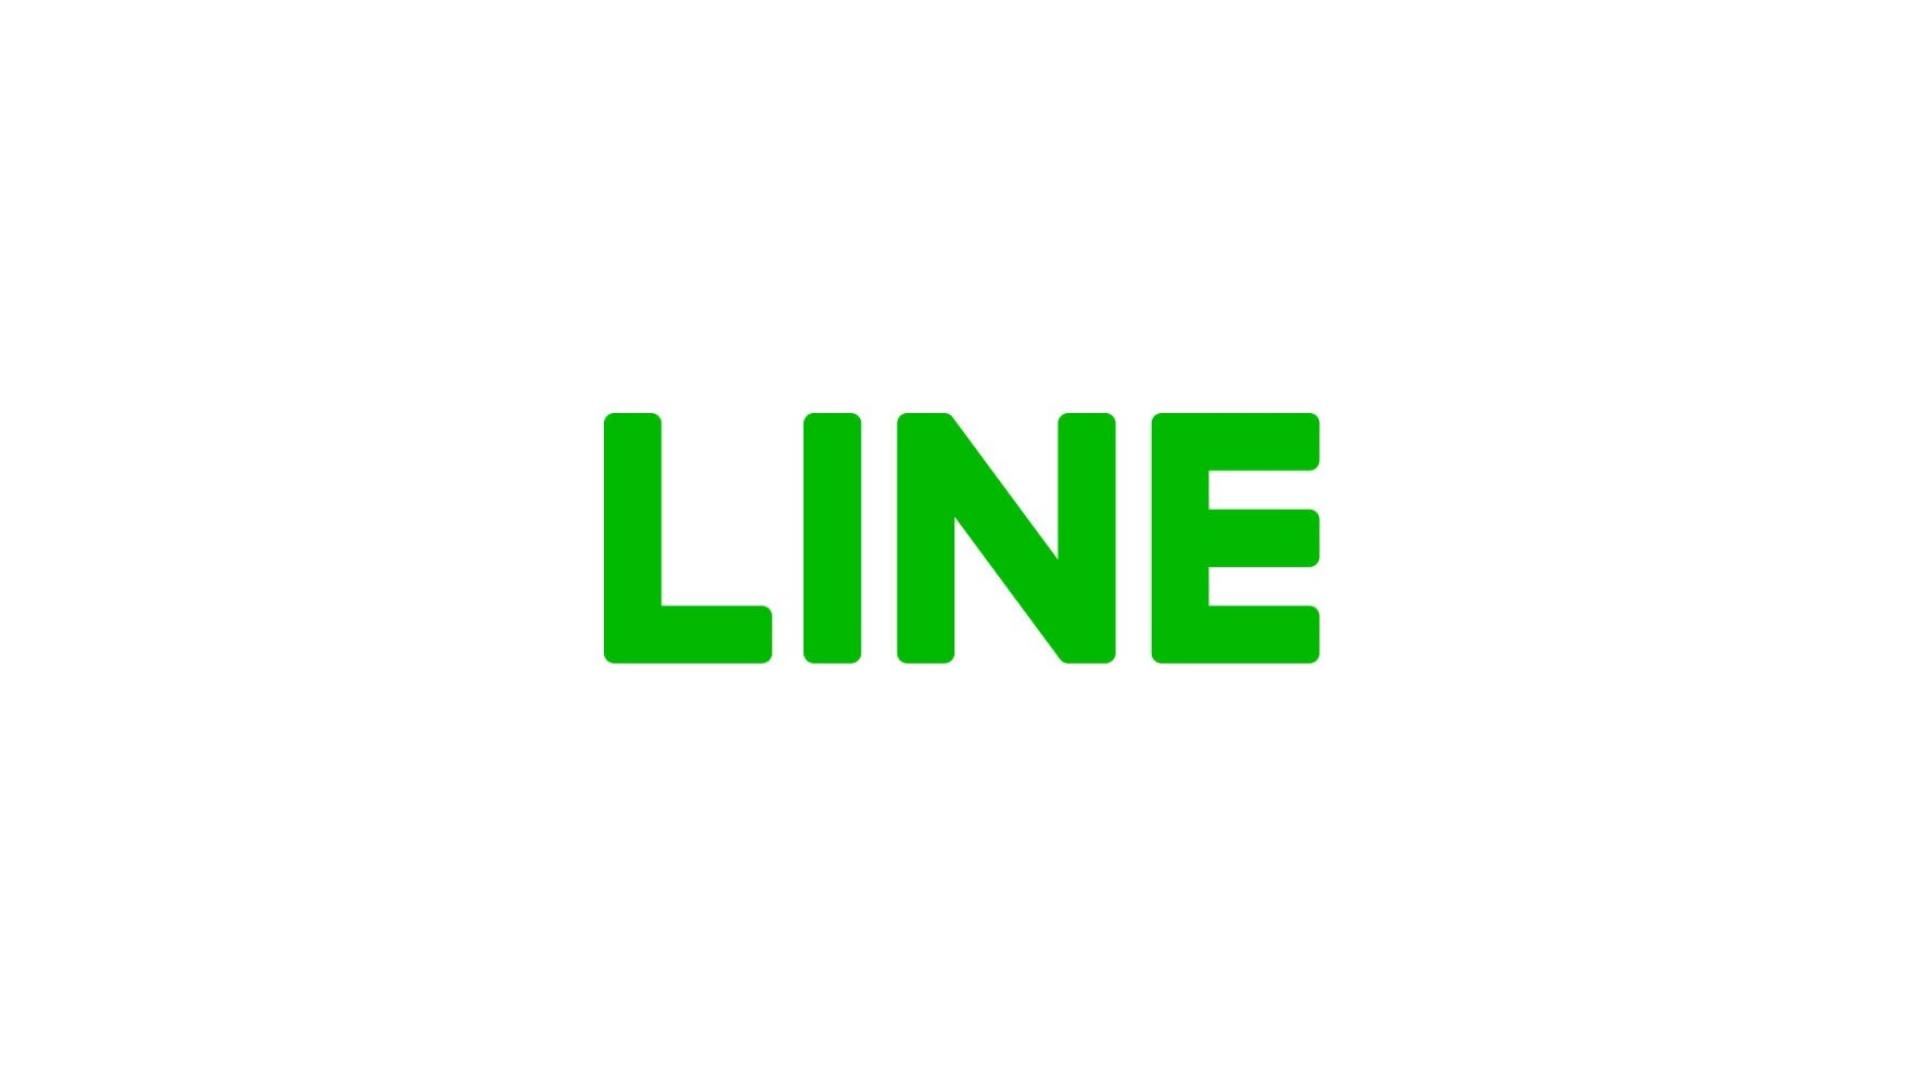 【LIFF】入力された内容をトークルームに送信するLIFFアプリを作る